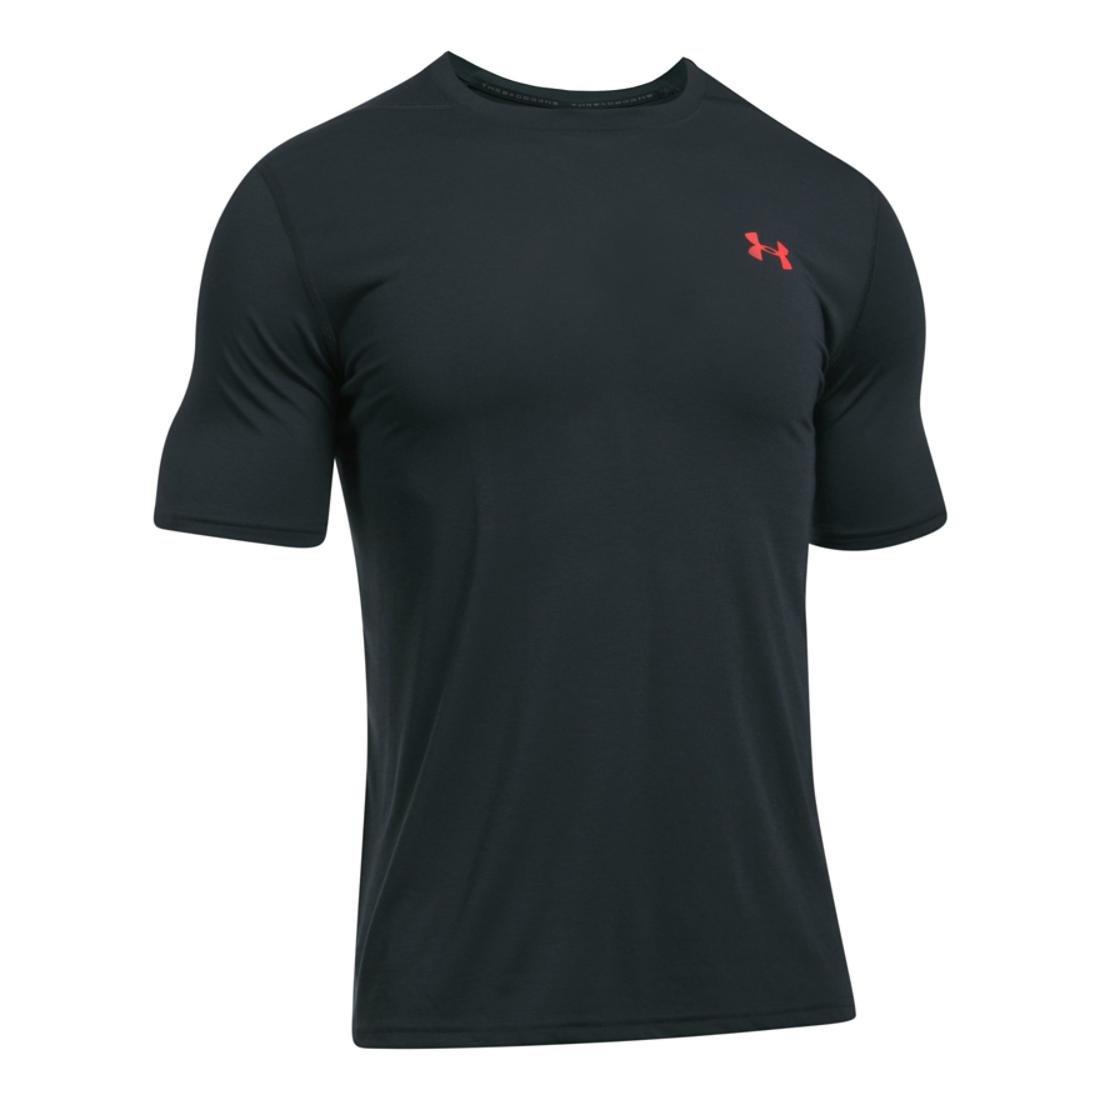 Under Armour Men's Threadborne Siro T Shirt